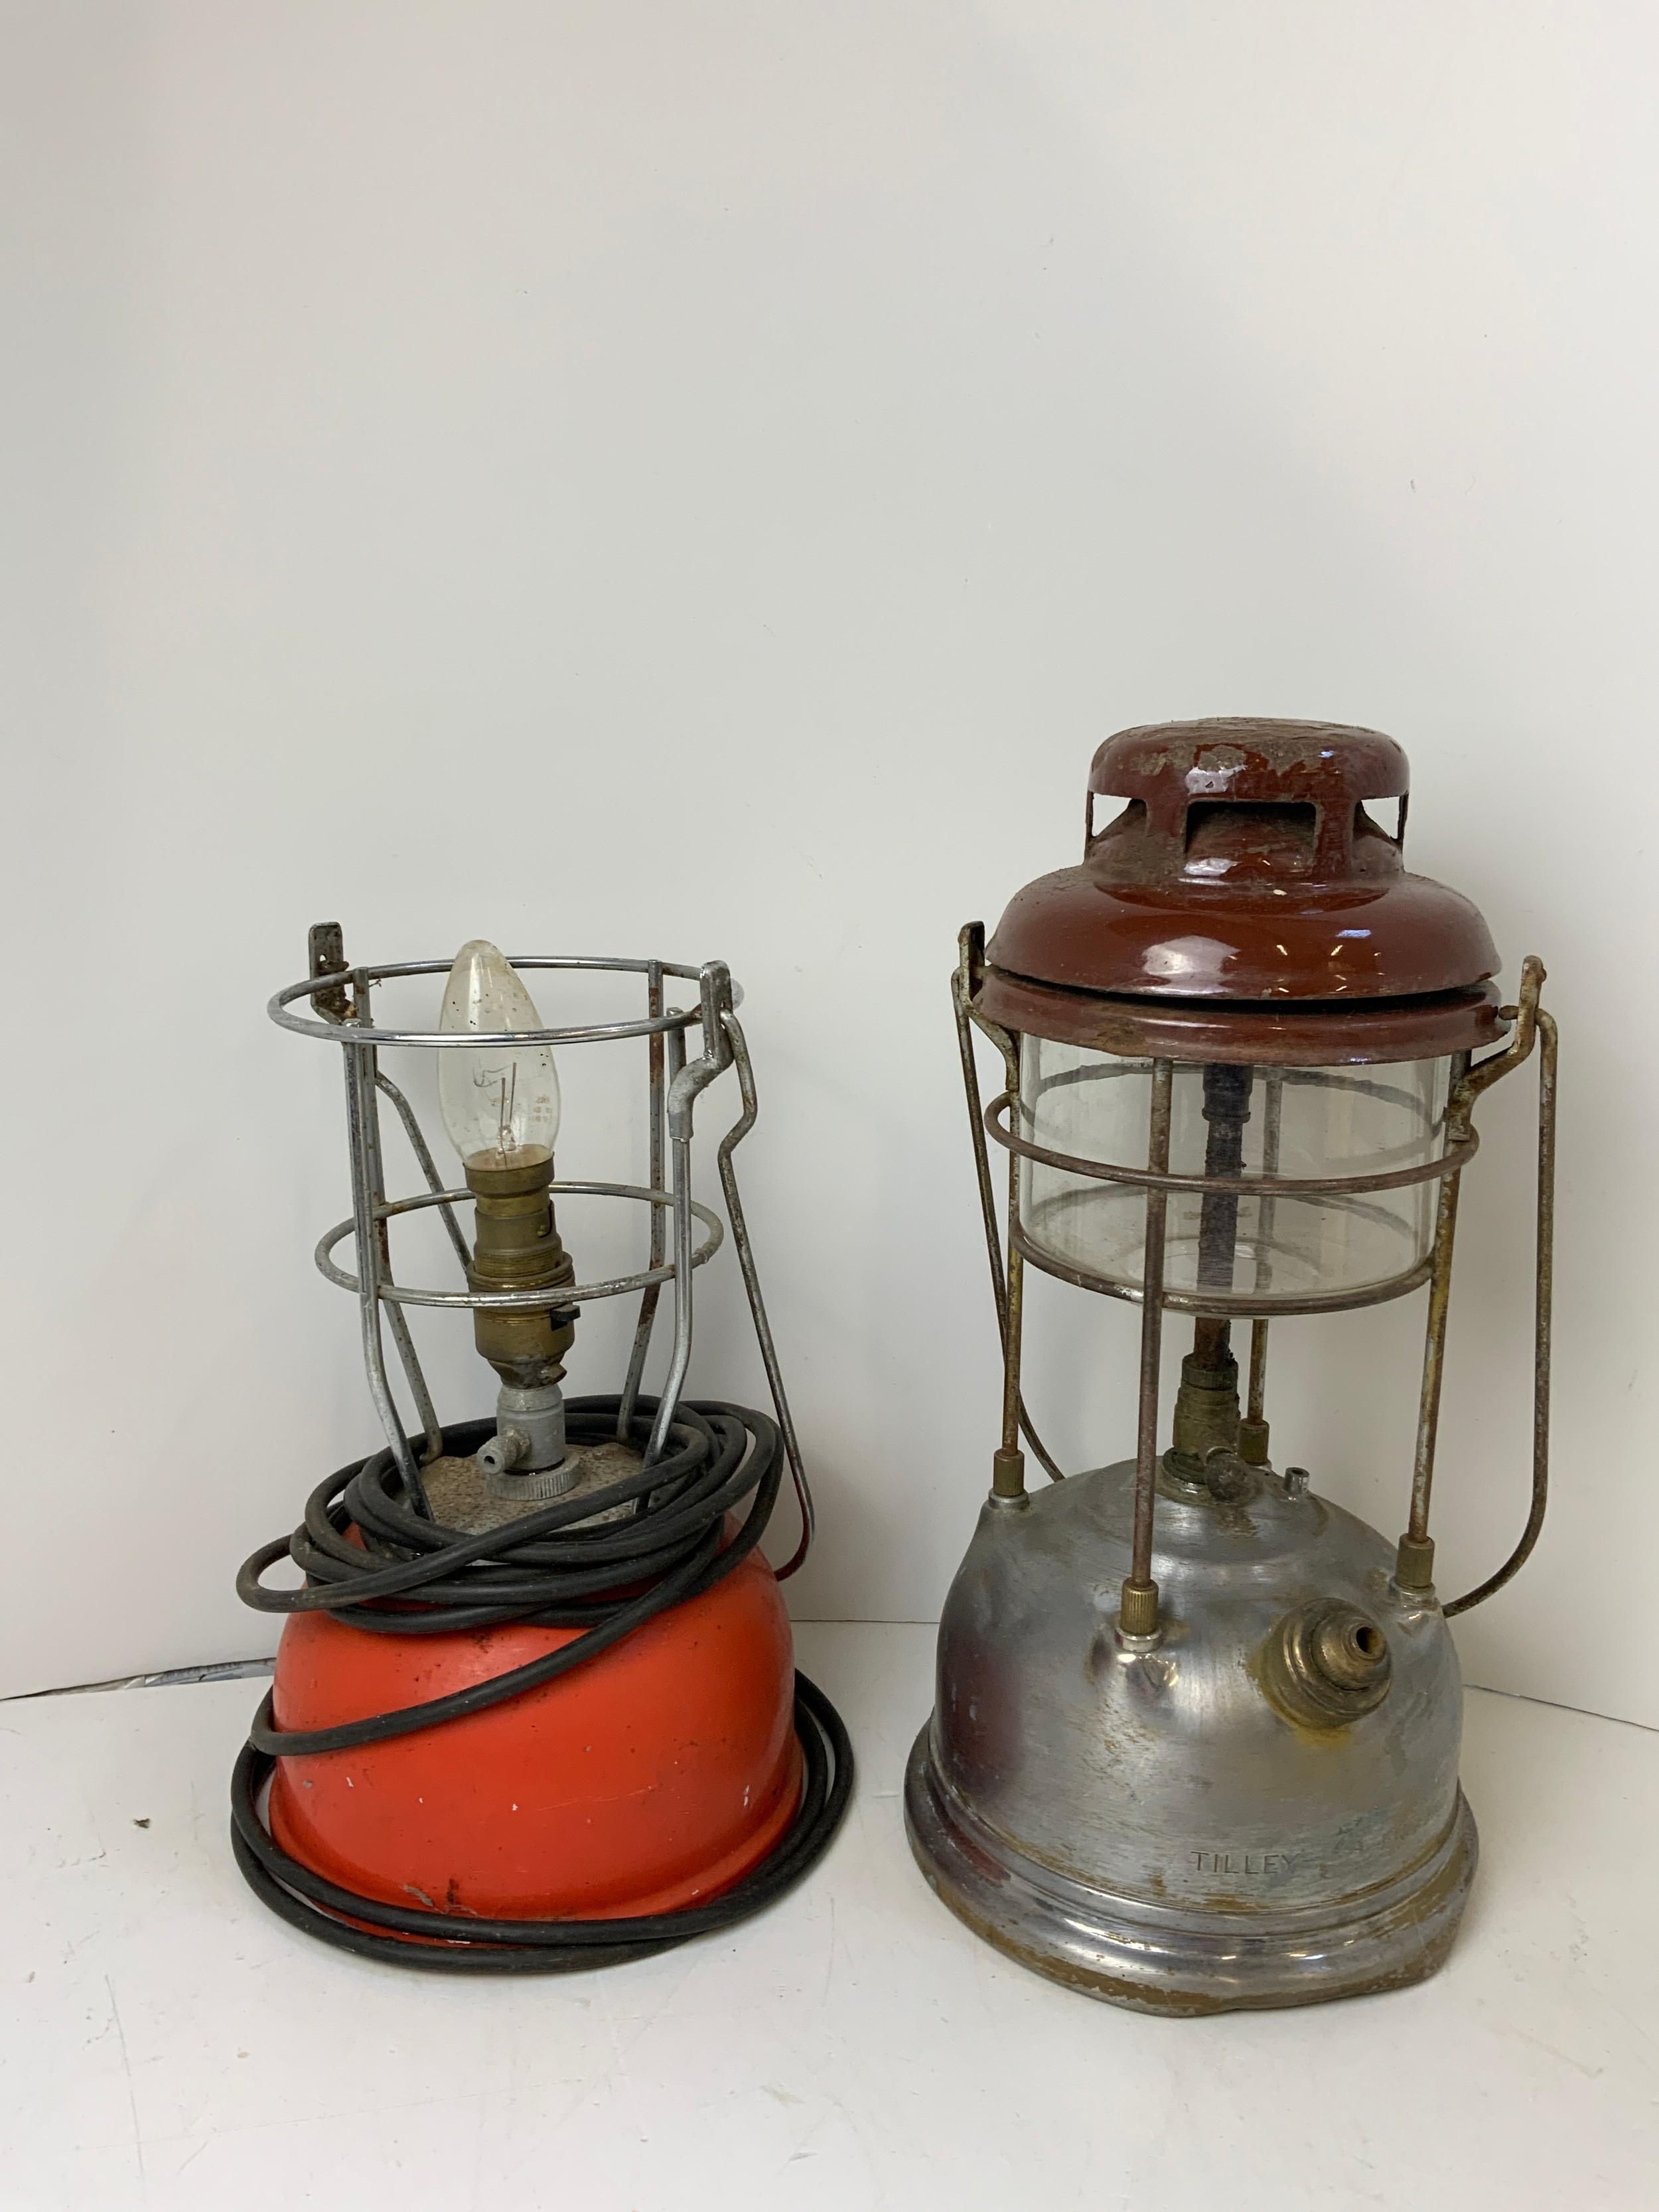 2x Tilley Lamps